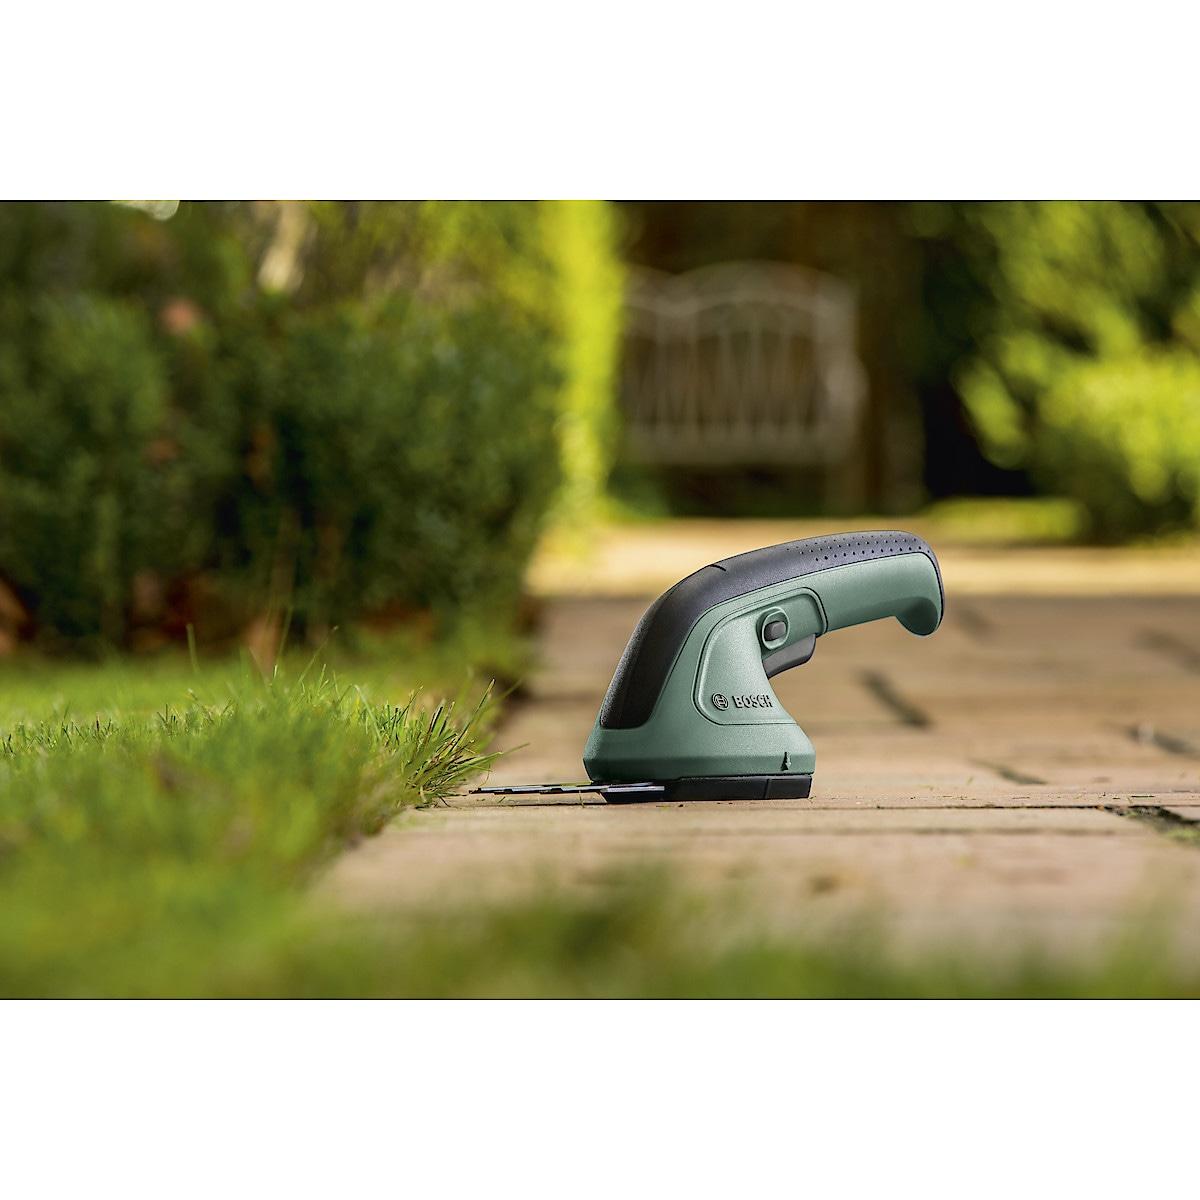 Monitoimitrimmeri EasyShear Bosch 3,6 V